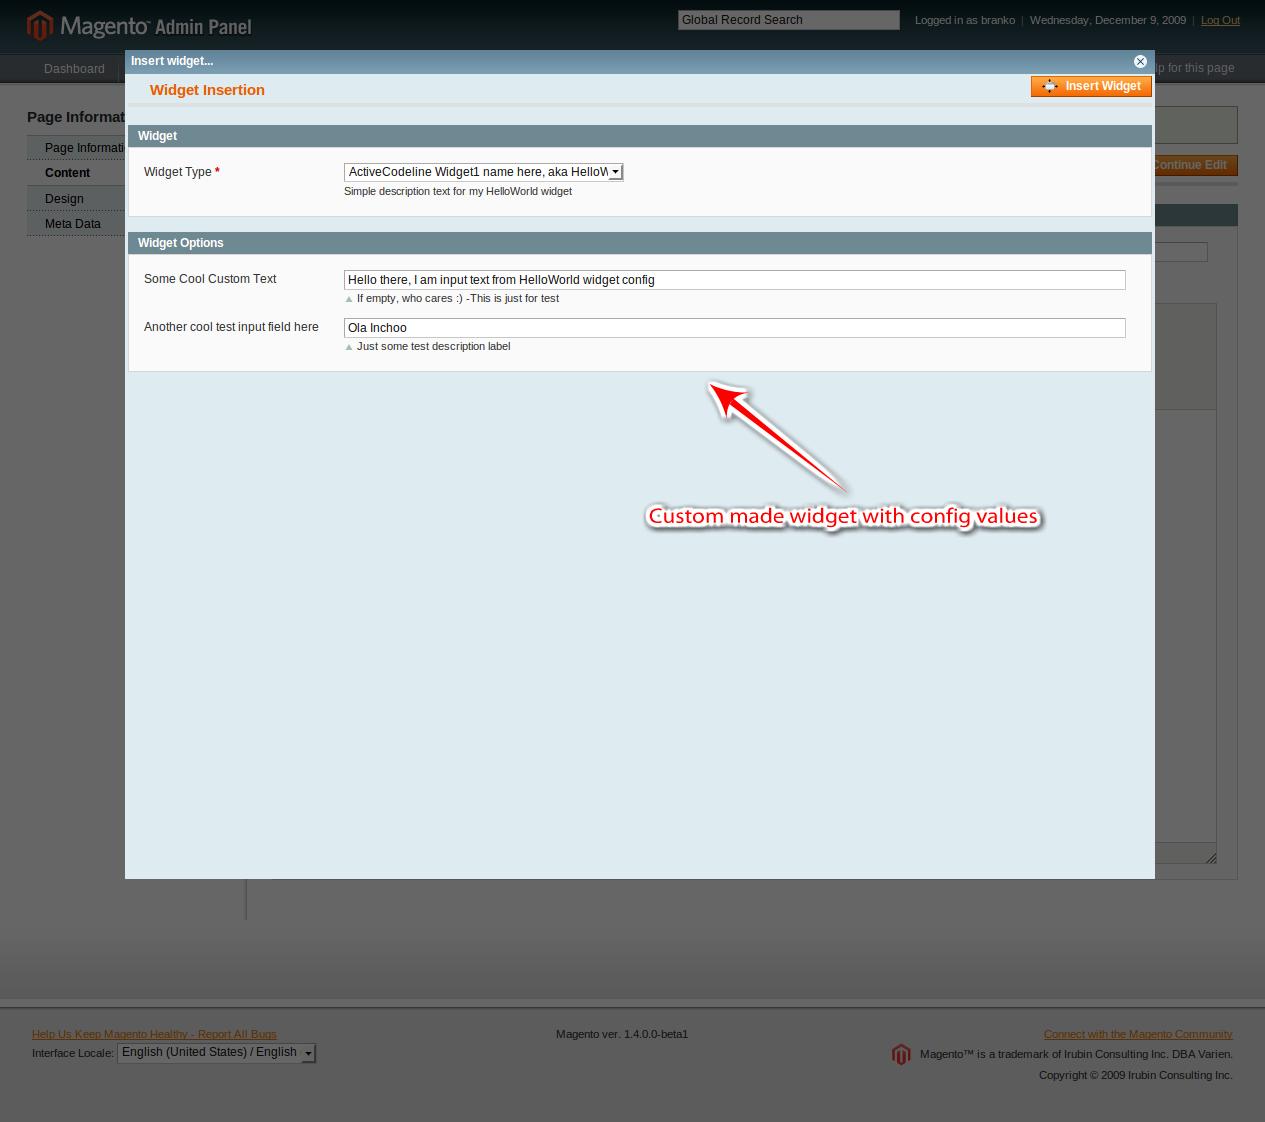 magento admin panel blank widget 2